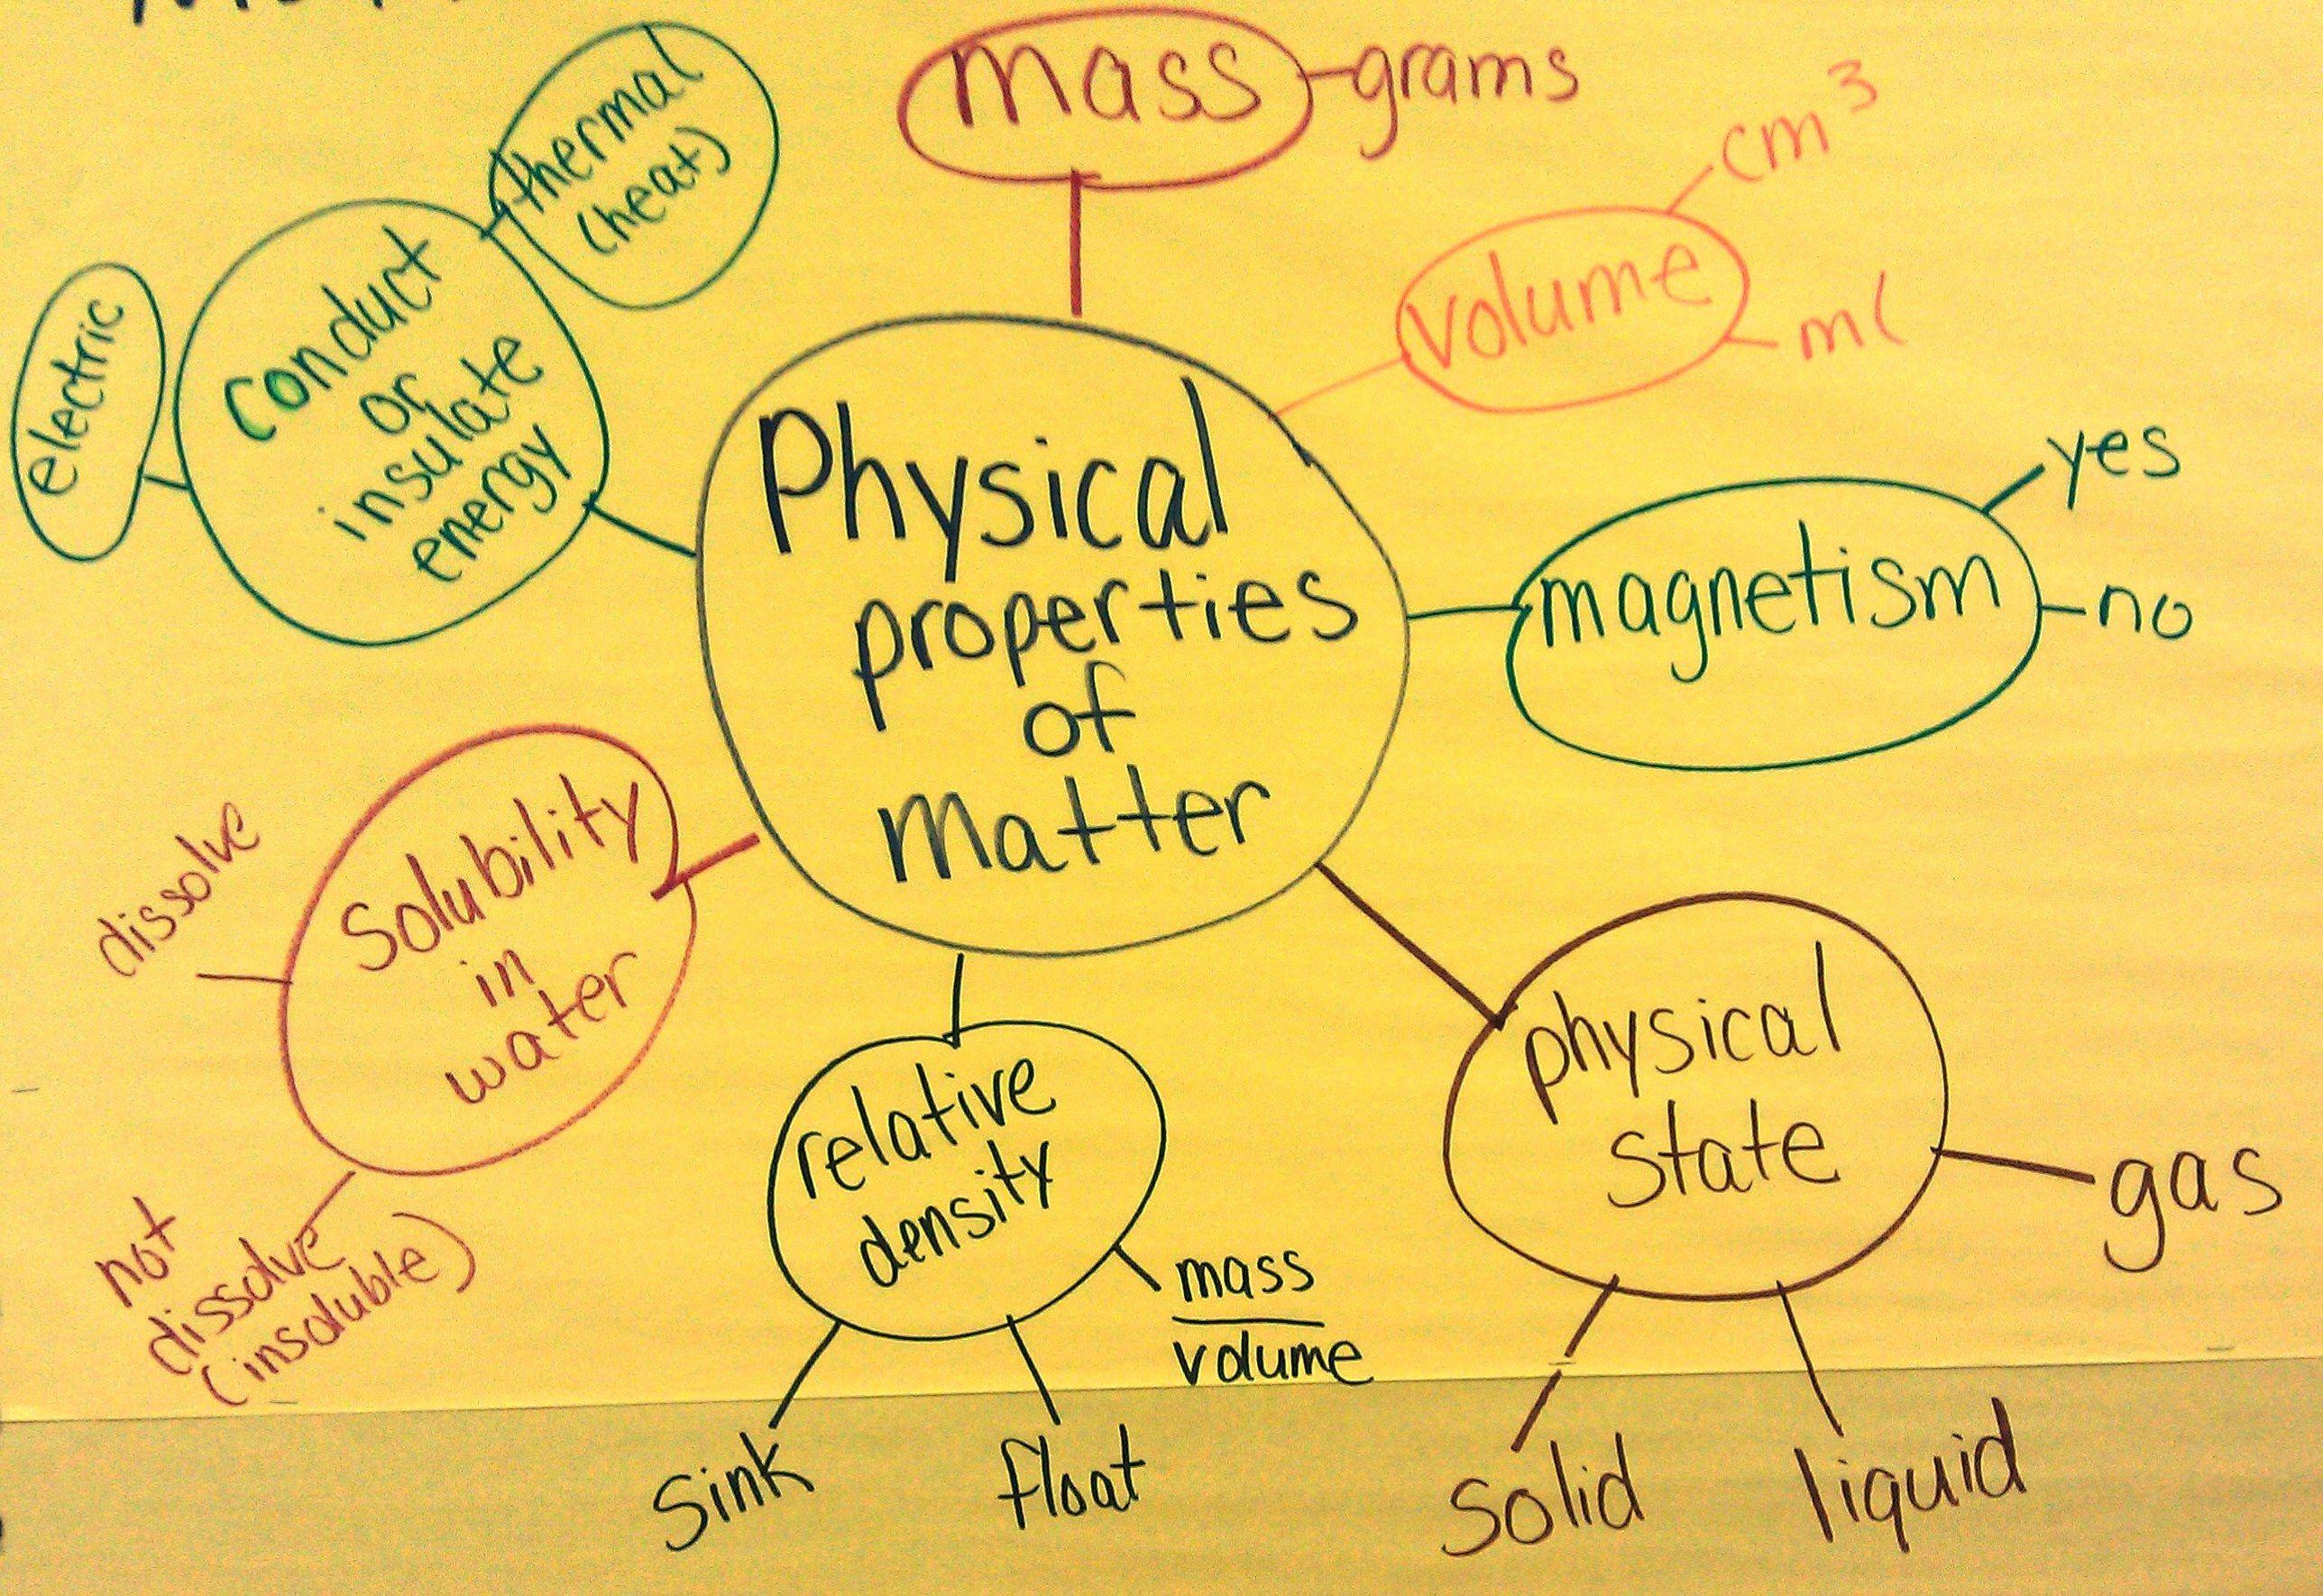 7 Physical Properties Of Matter Web Diagram